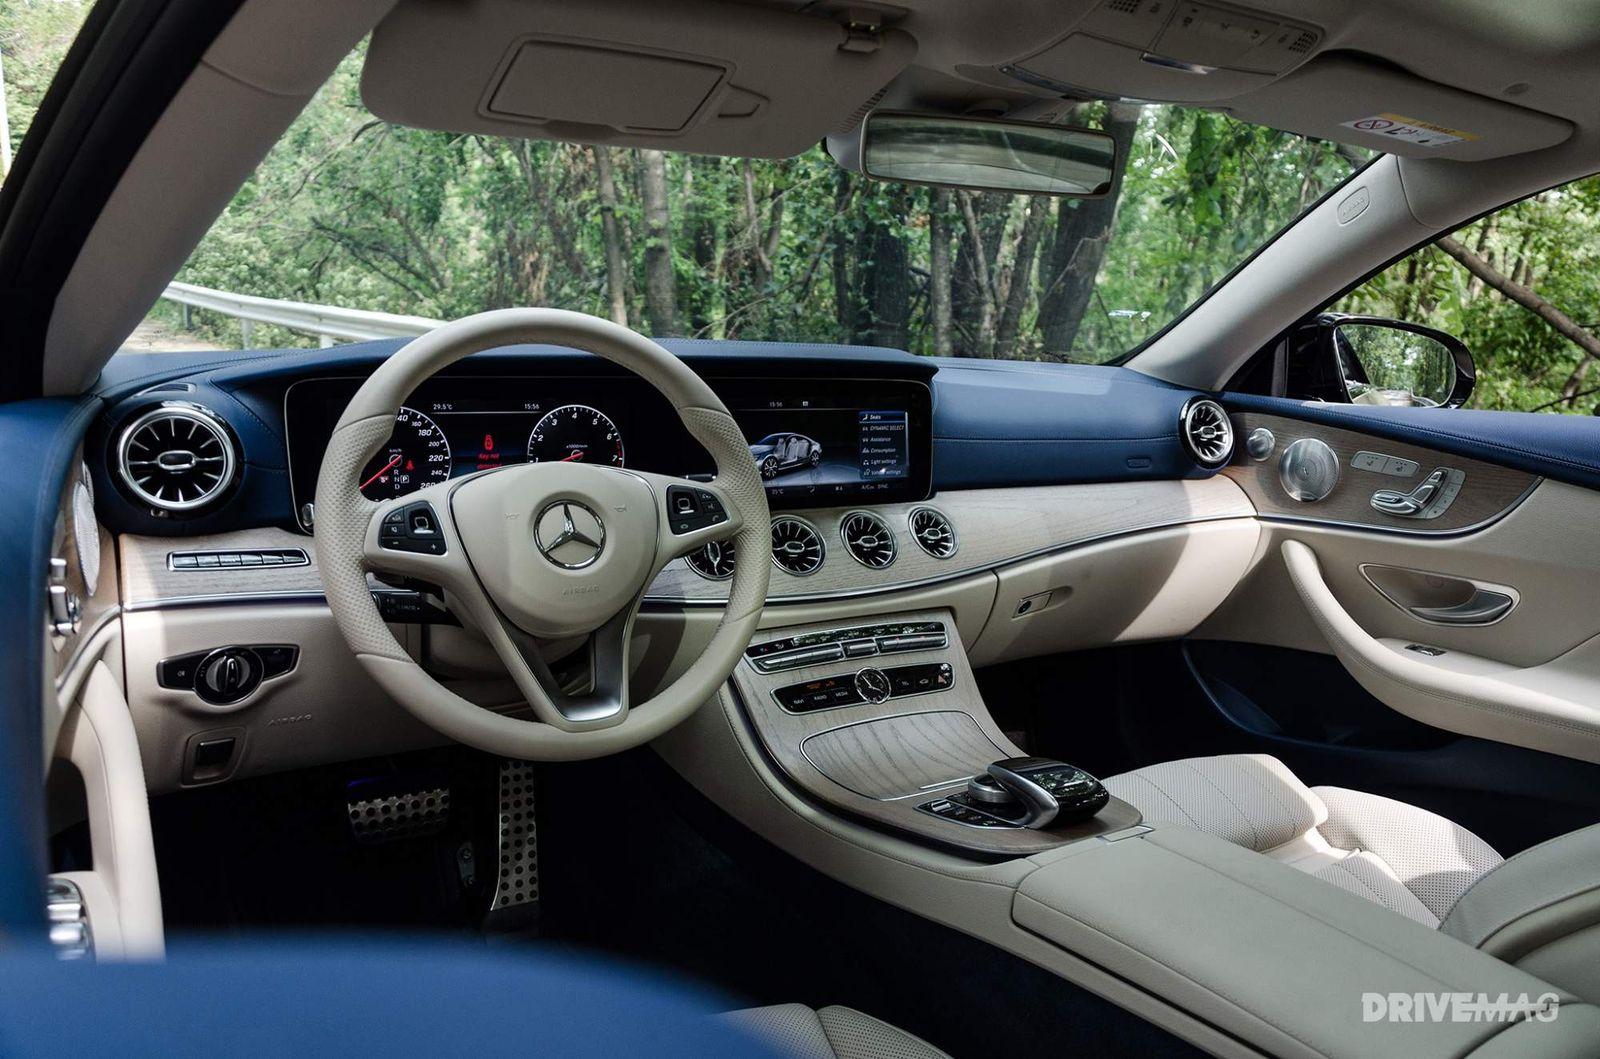 2017 Mercedes-Benz E-Class E 400 4MATIC Coupé review